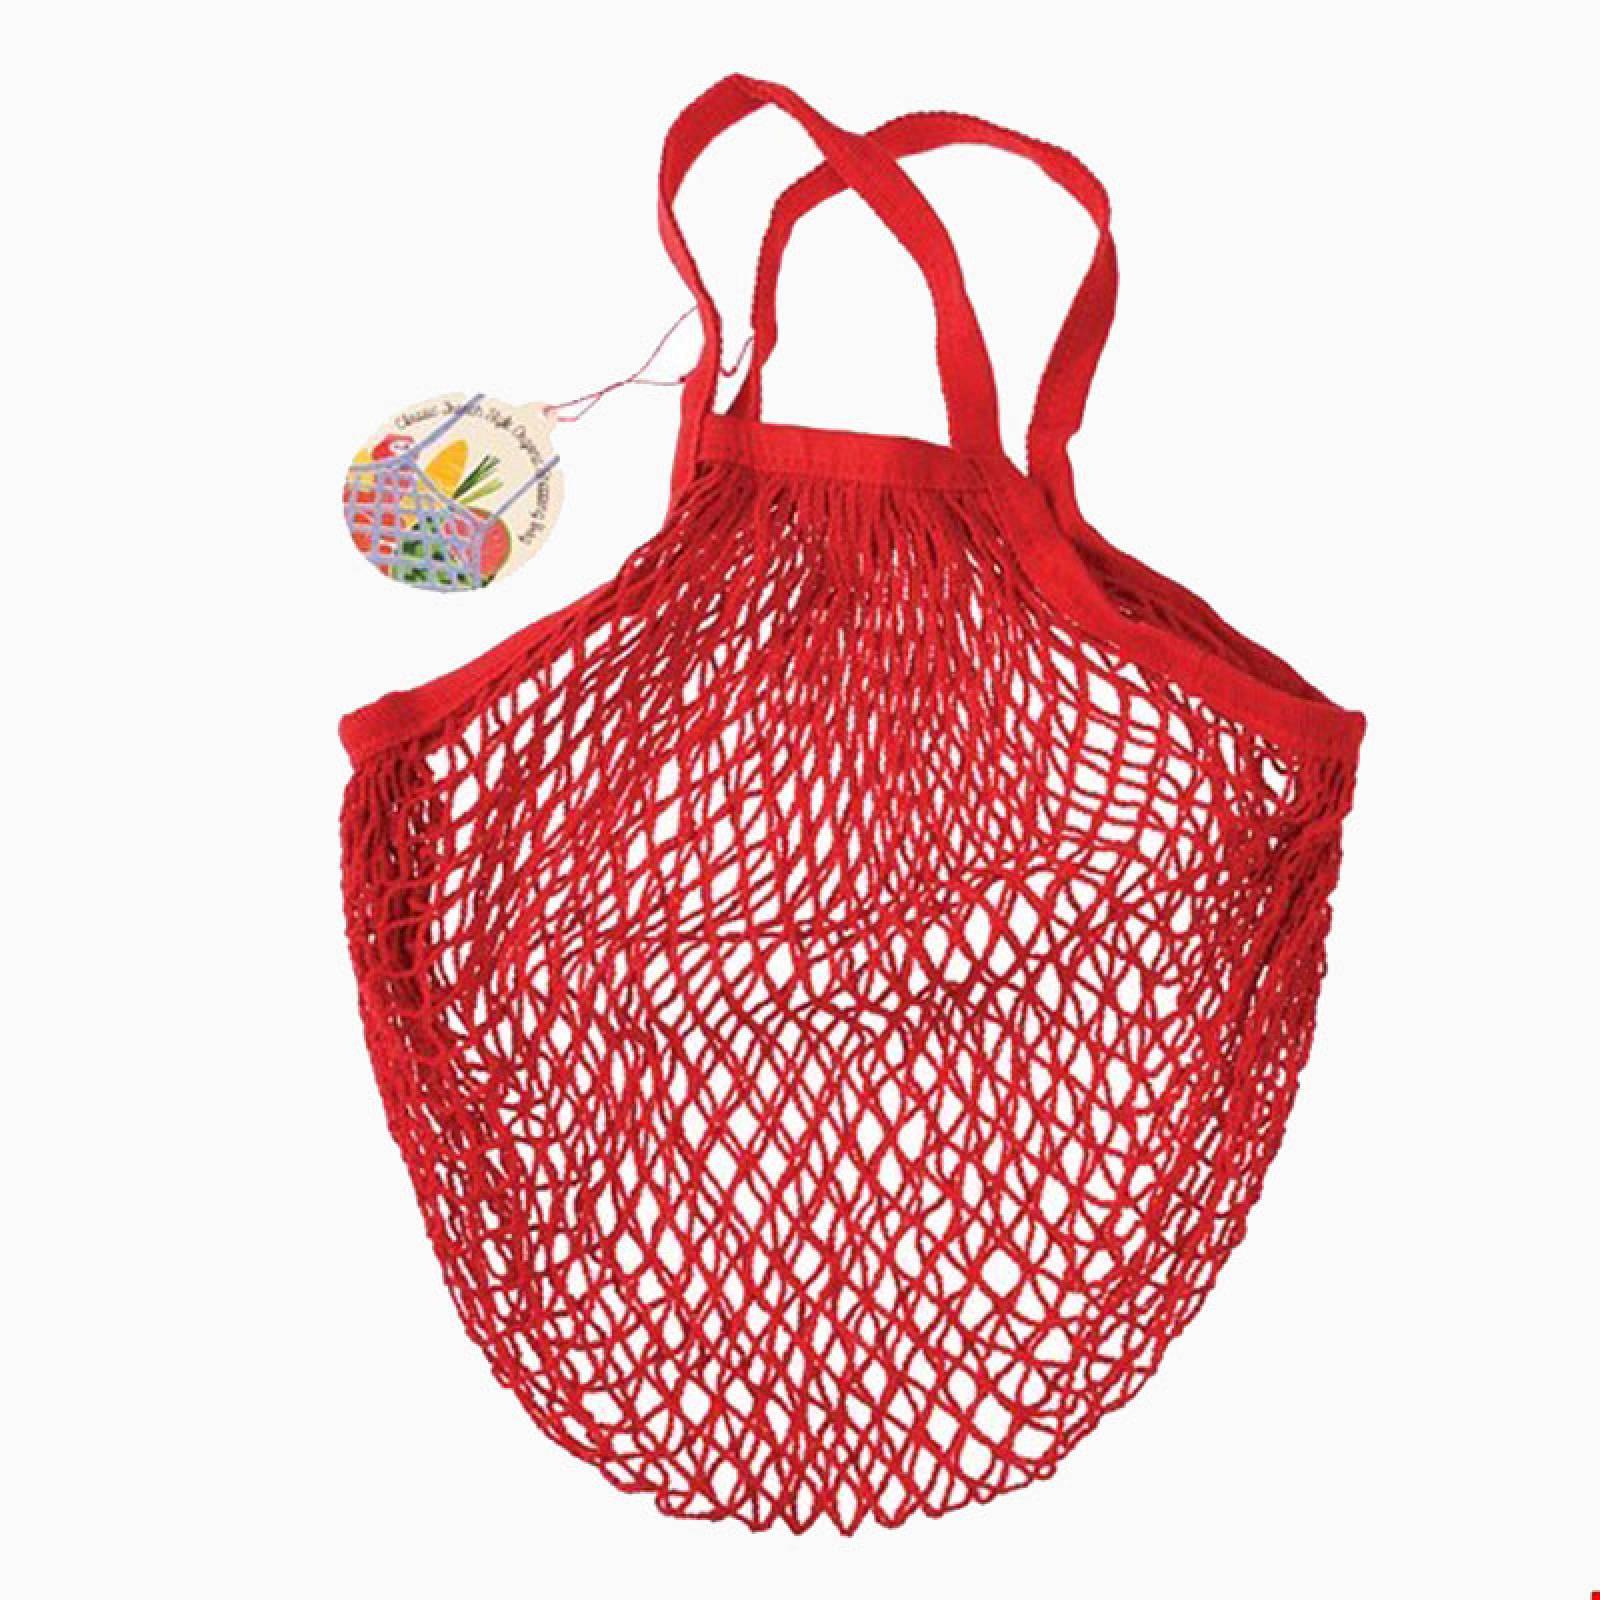 Red String Shopping Bag